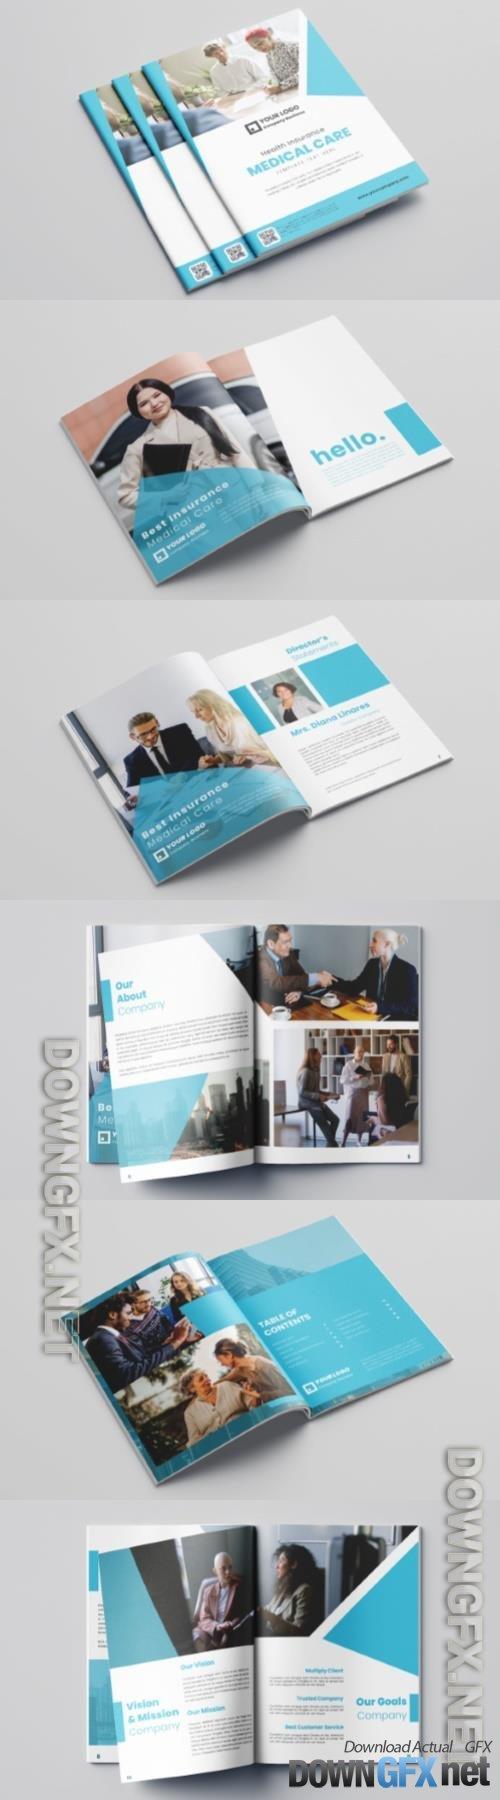 Health Insurance Brochure Vol.4